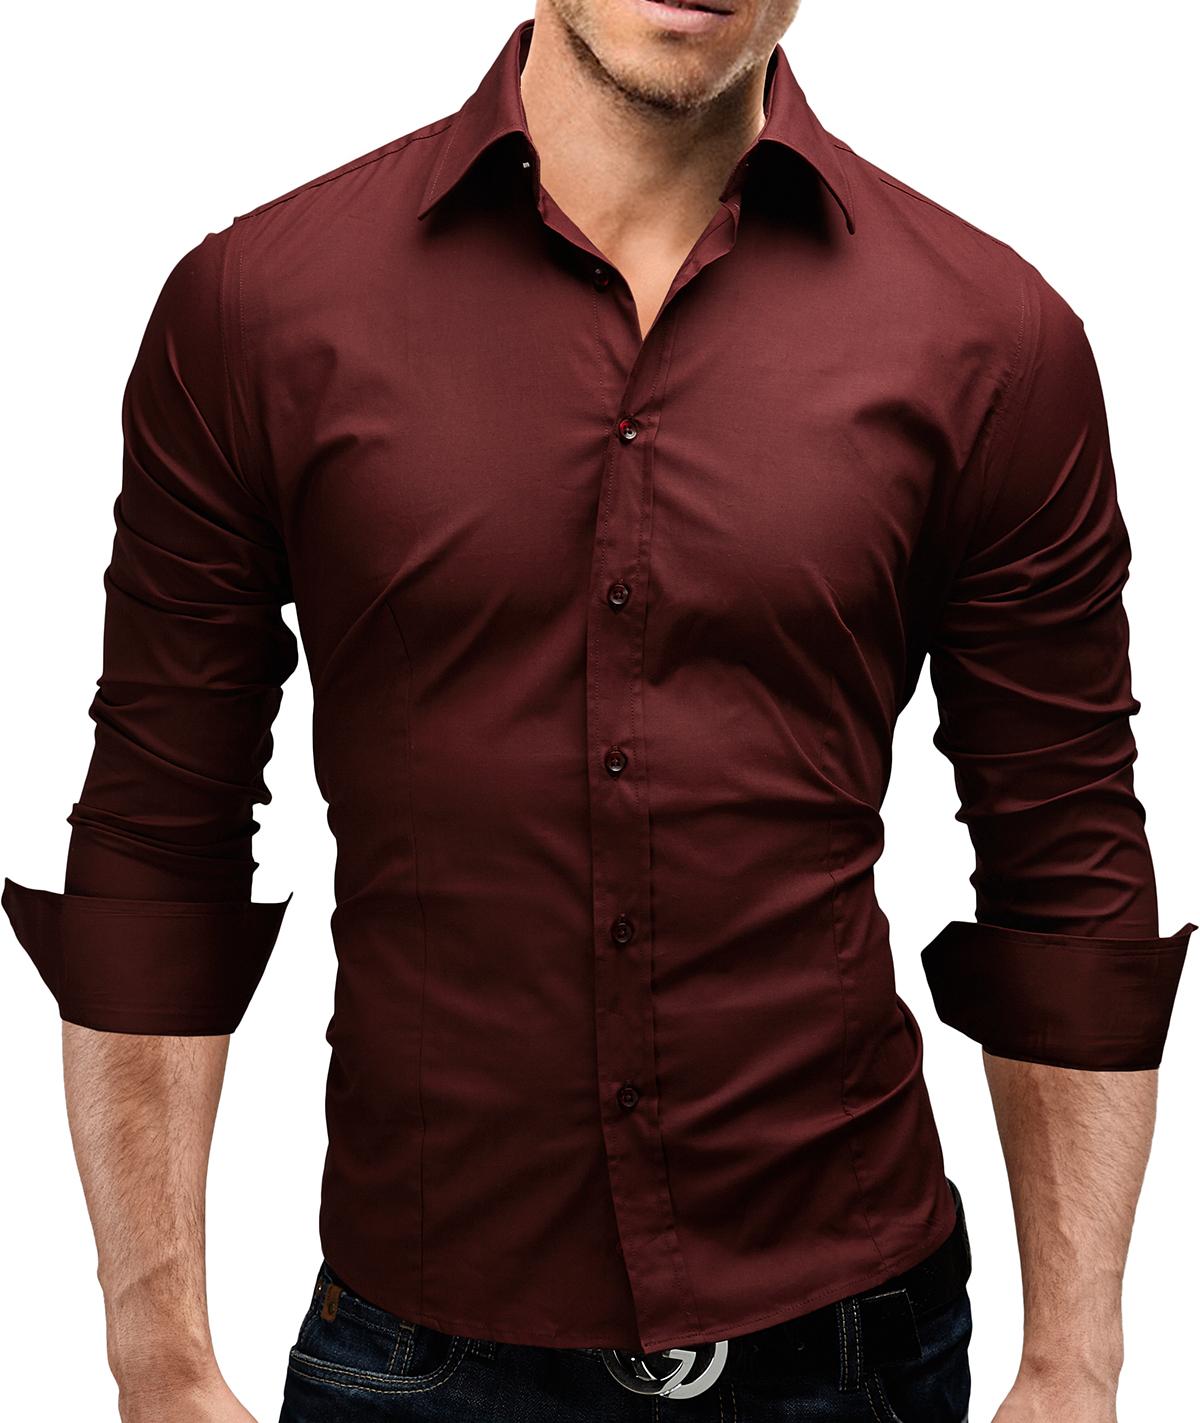 merish herren hemd 6 modelle s xxl slim fit neu t shirt. Black Bedroom Furniture Sets. Home Design Ideas